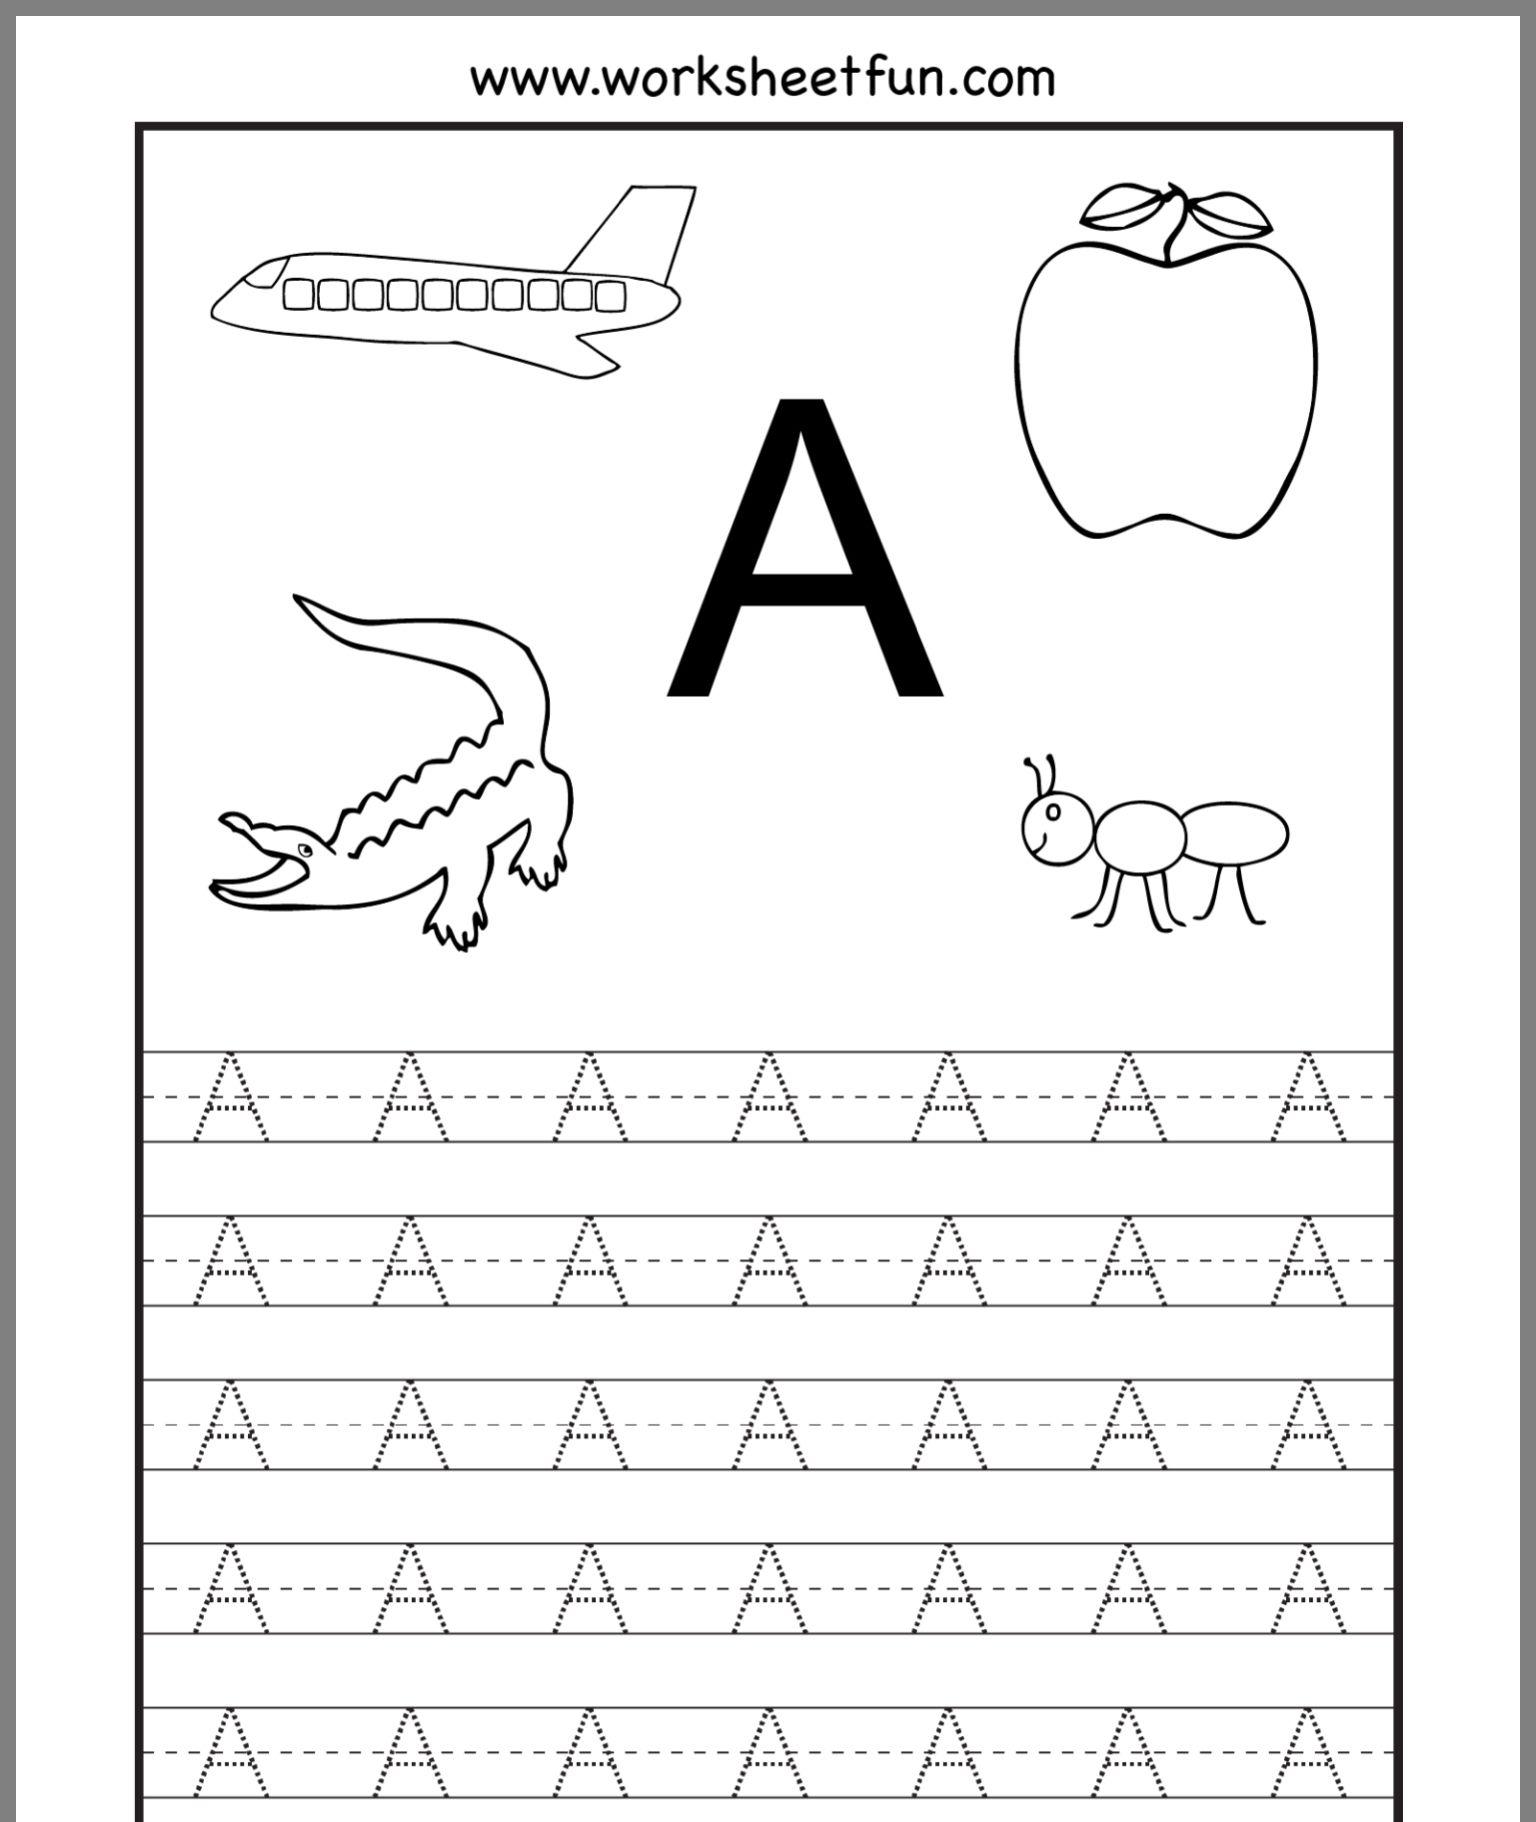 Free Preschool Worksheets Image By Molly Hurd Beach On